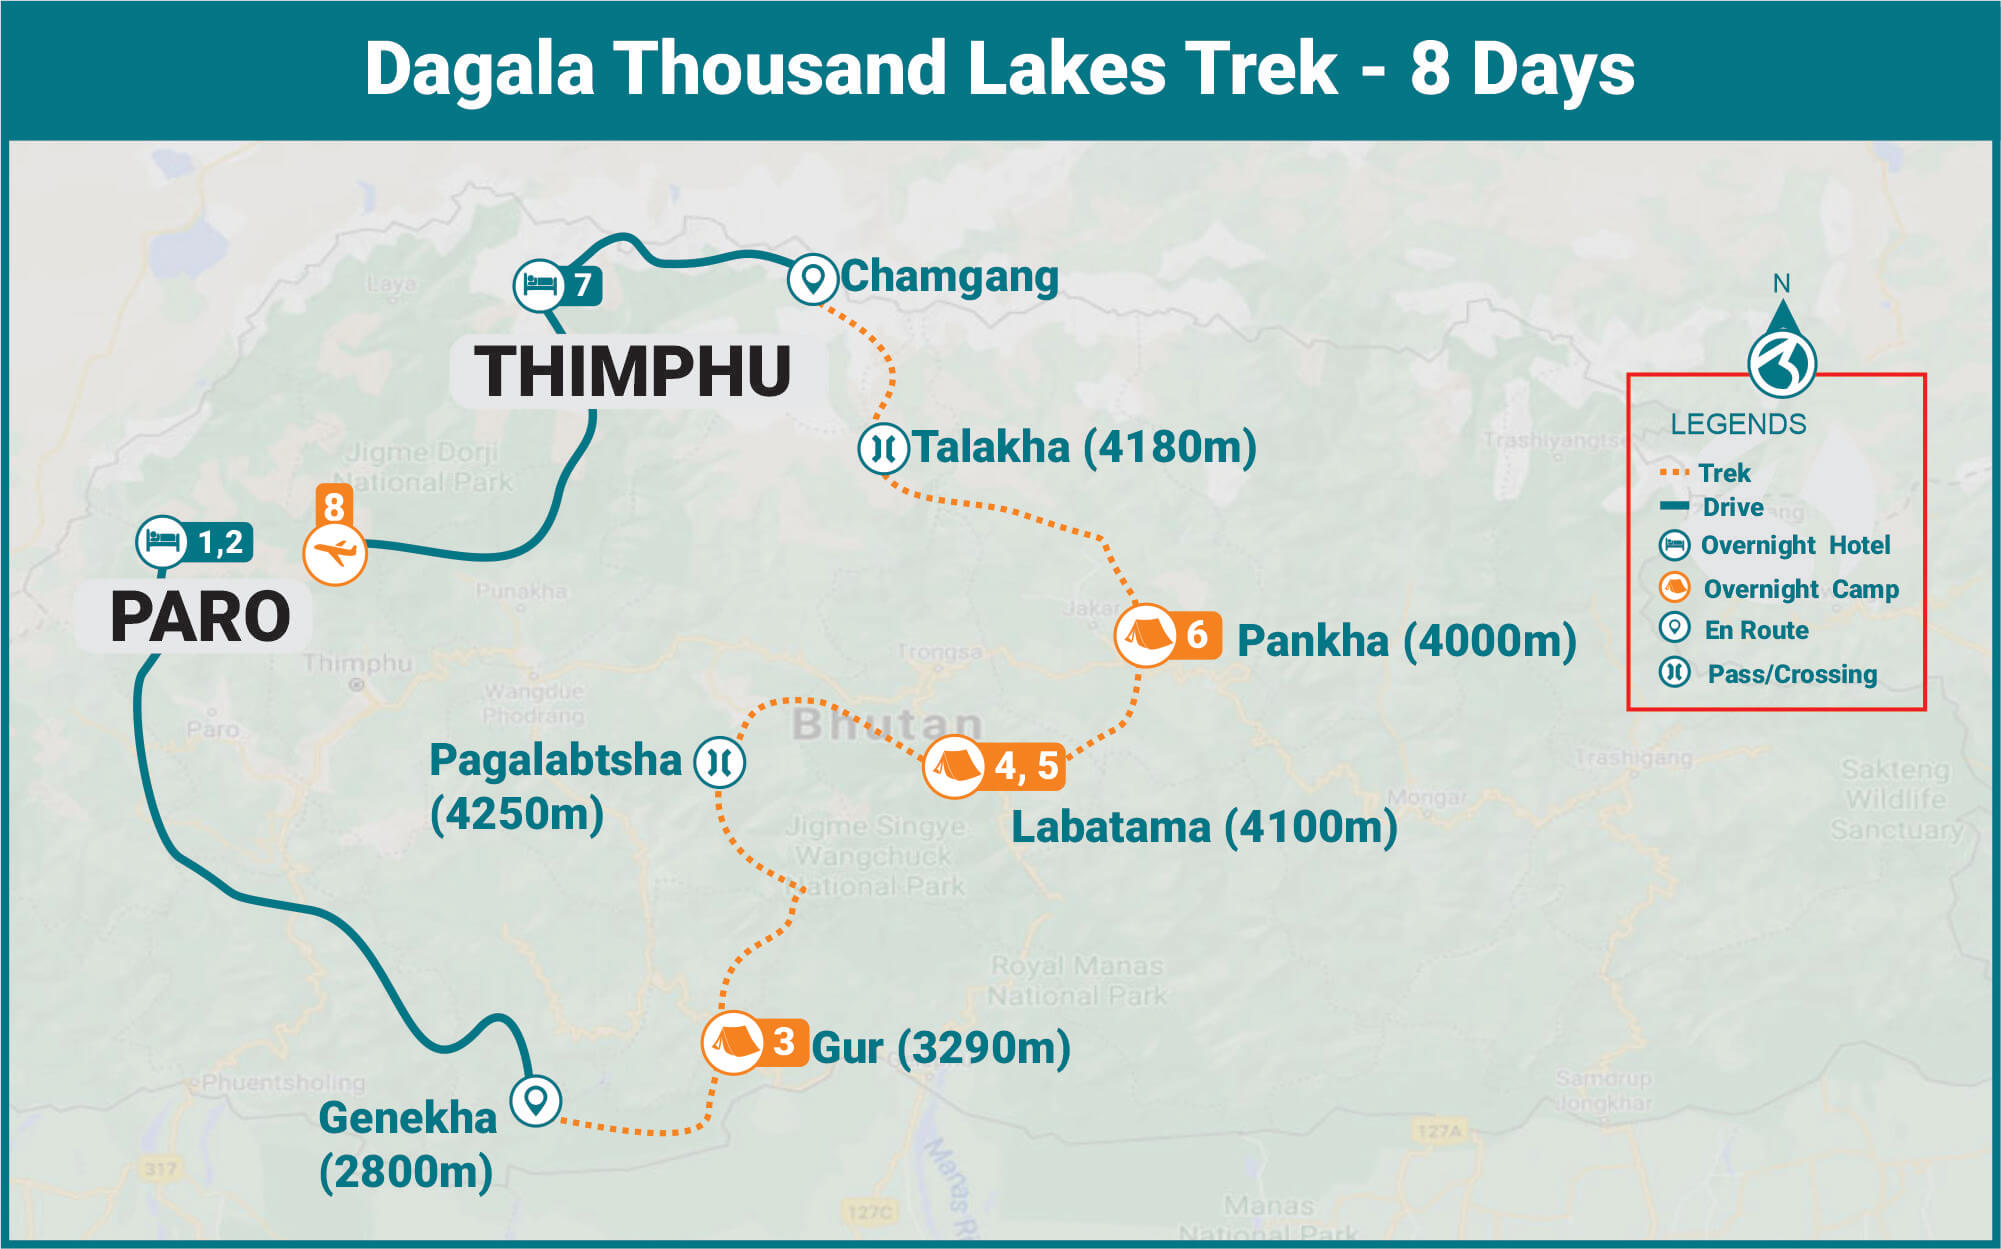 Dagala Thousand Lakes Trek Route Map